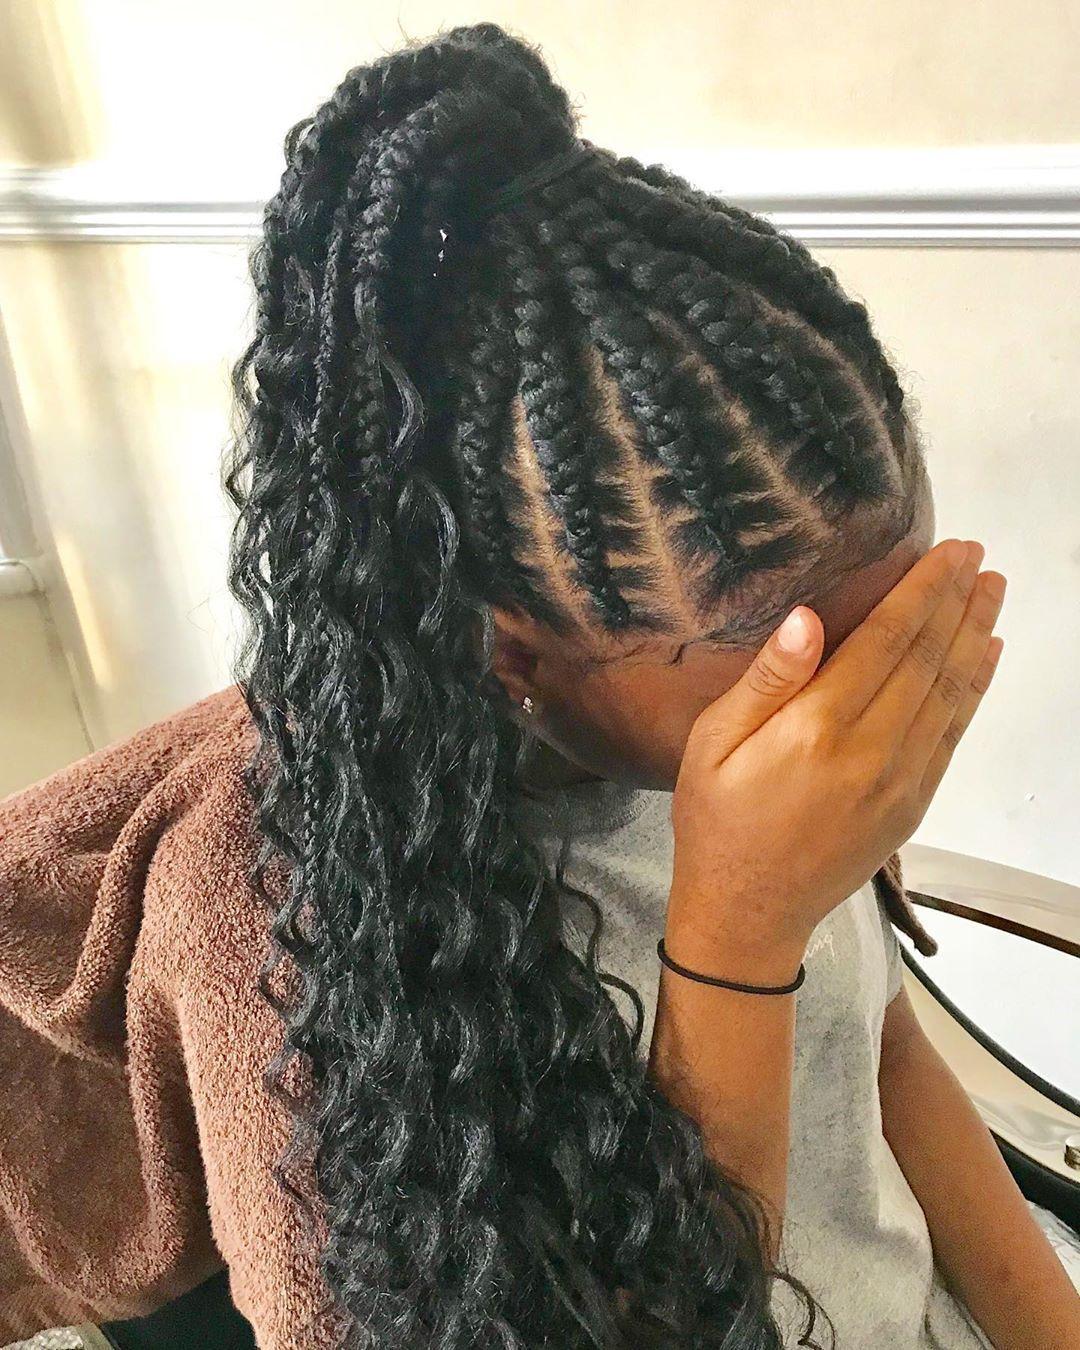 Cornrows Hairstyles For Black Women Cornrows Cornrows Braids Braids Tribal Braids Braided Hairstyles Bana In 2020 Hair Styles Cornrow Ponytail Cornrow Hairstyles